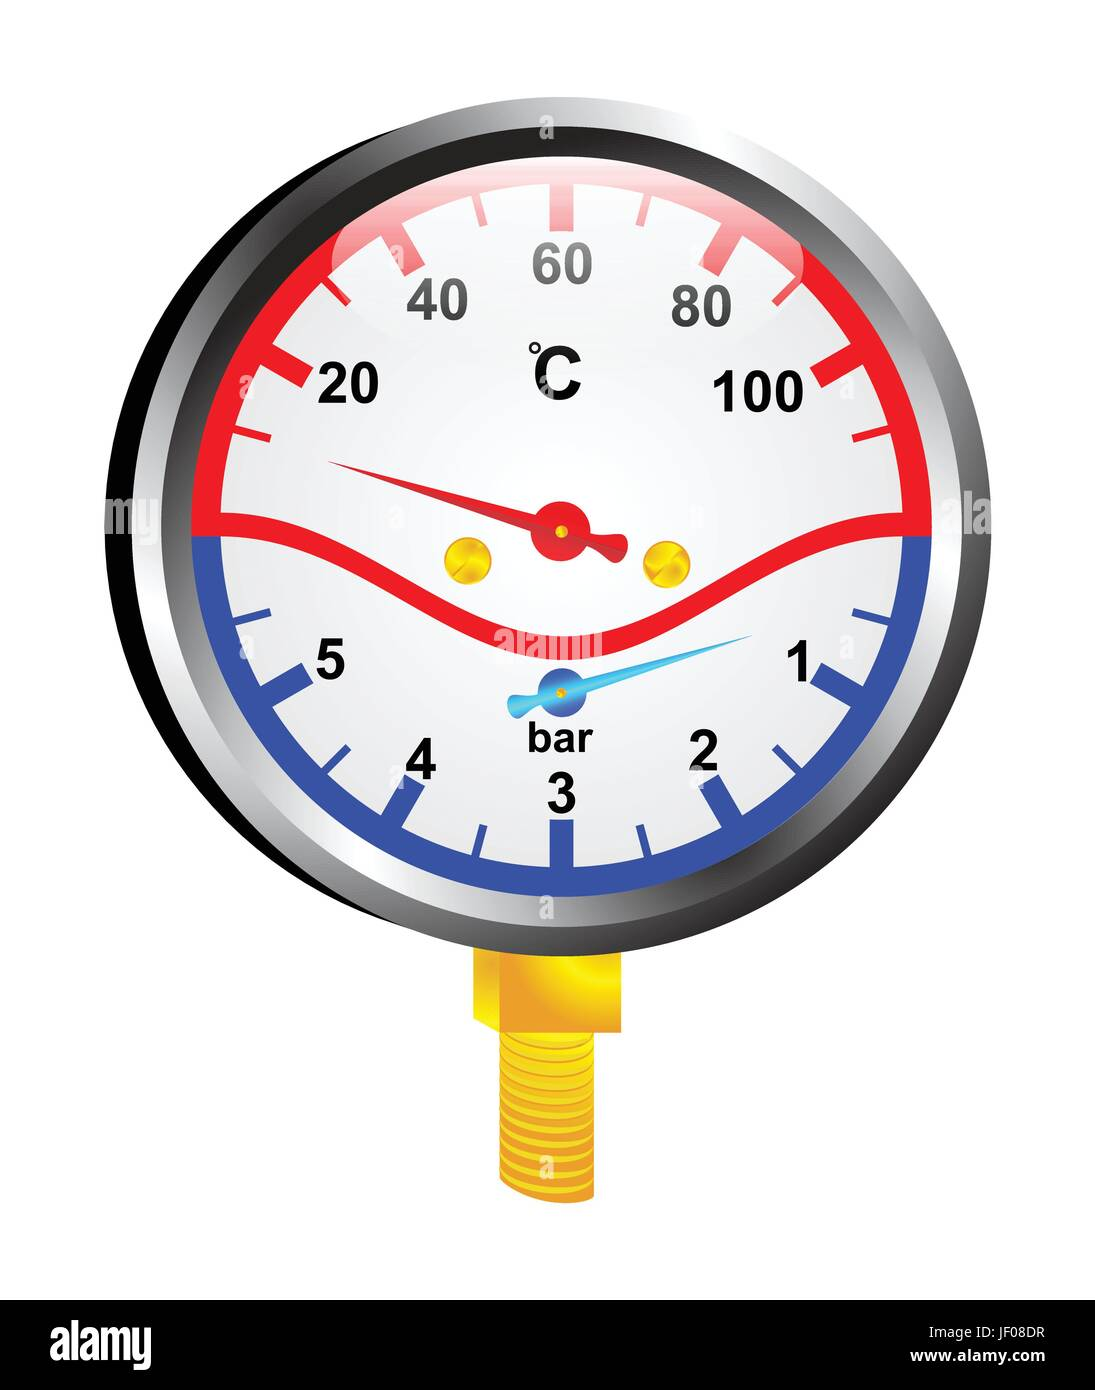 verification, measurement, temperature, installation, indicator, measure, - Stock Vector